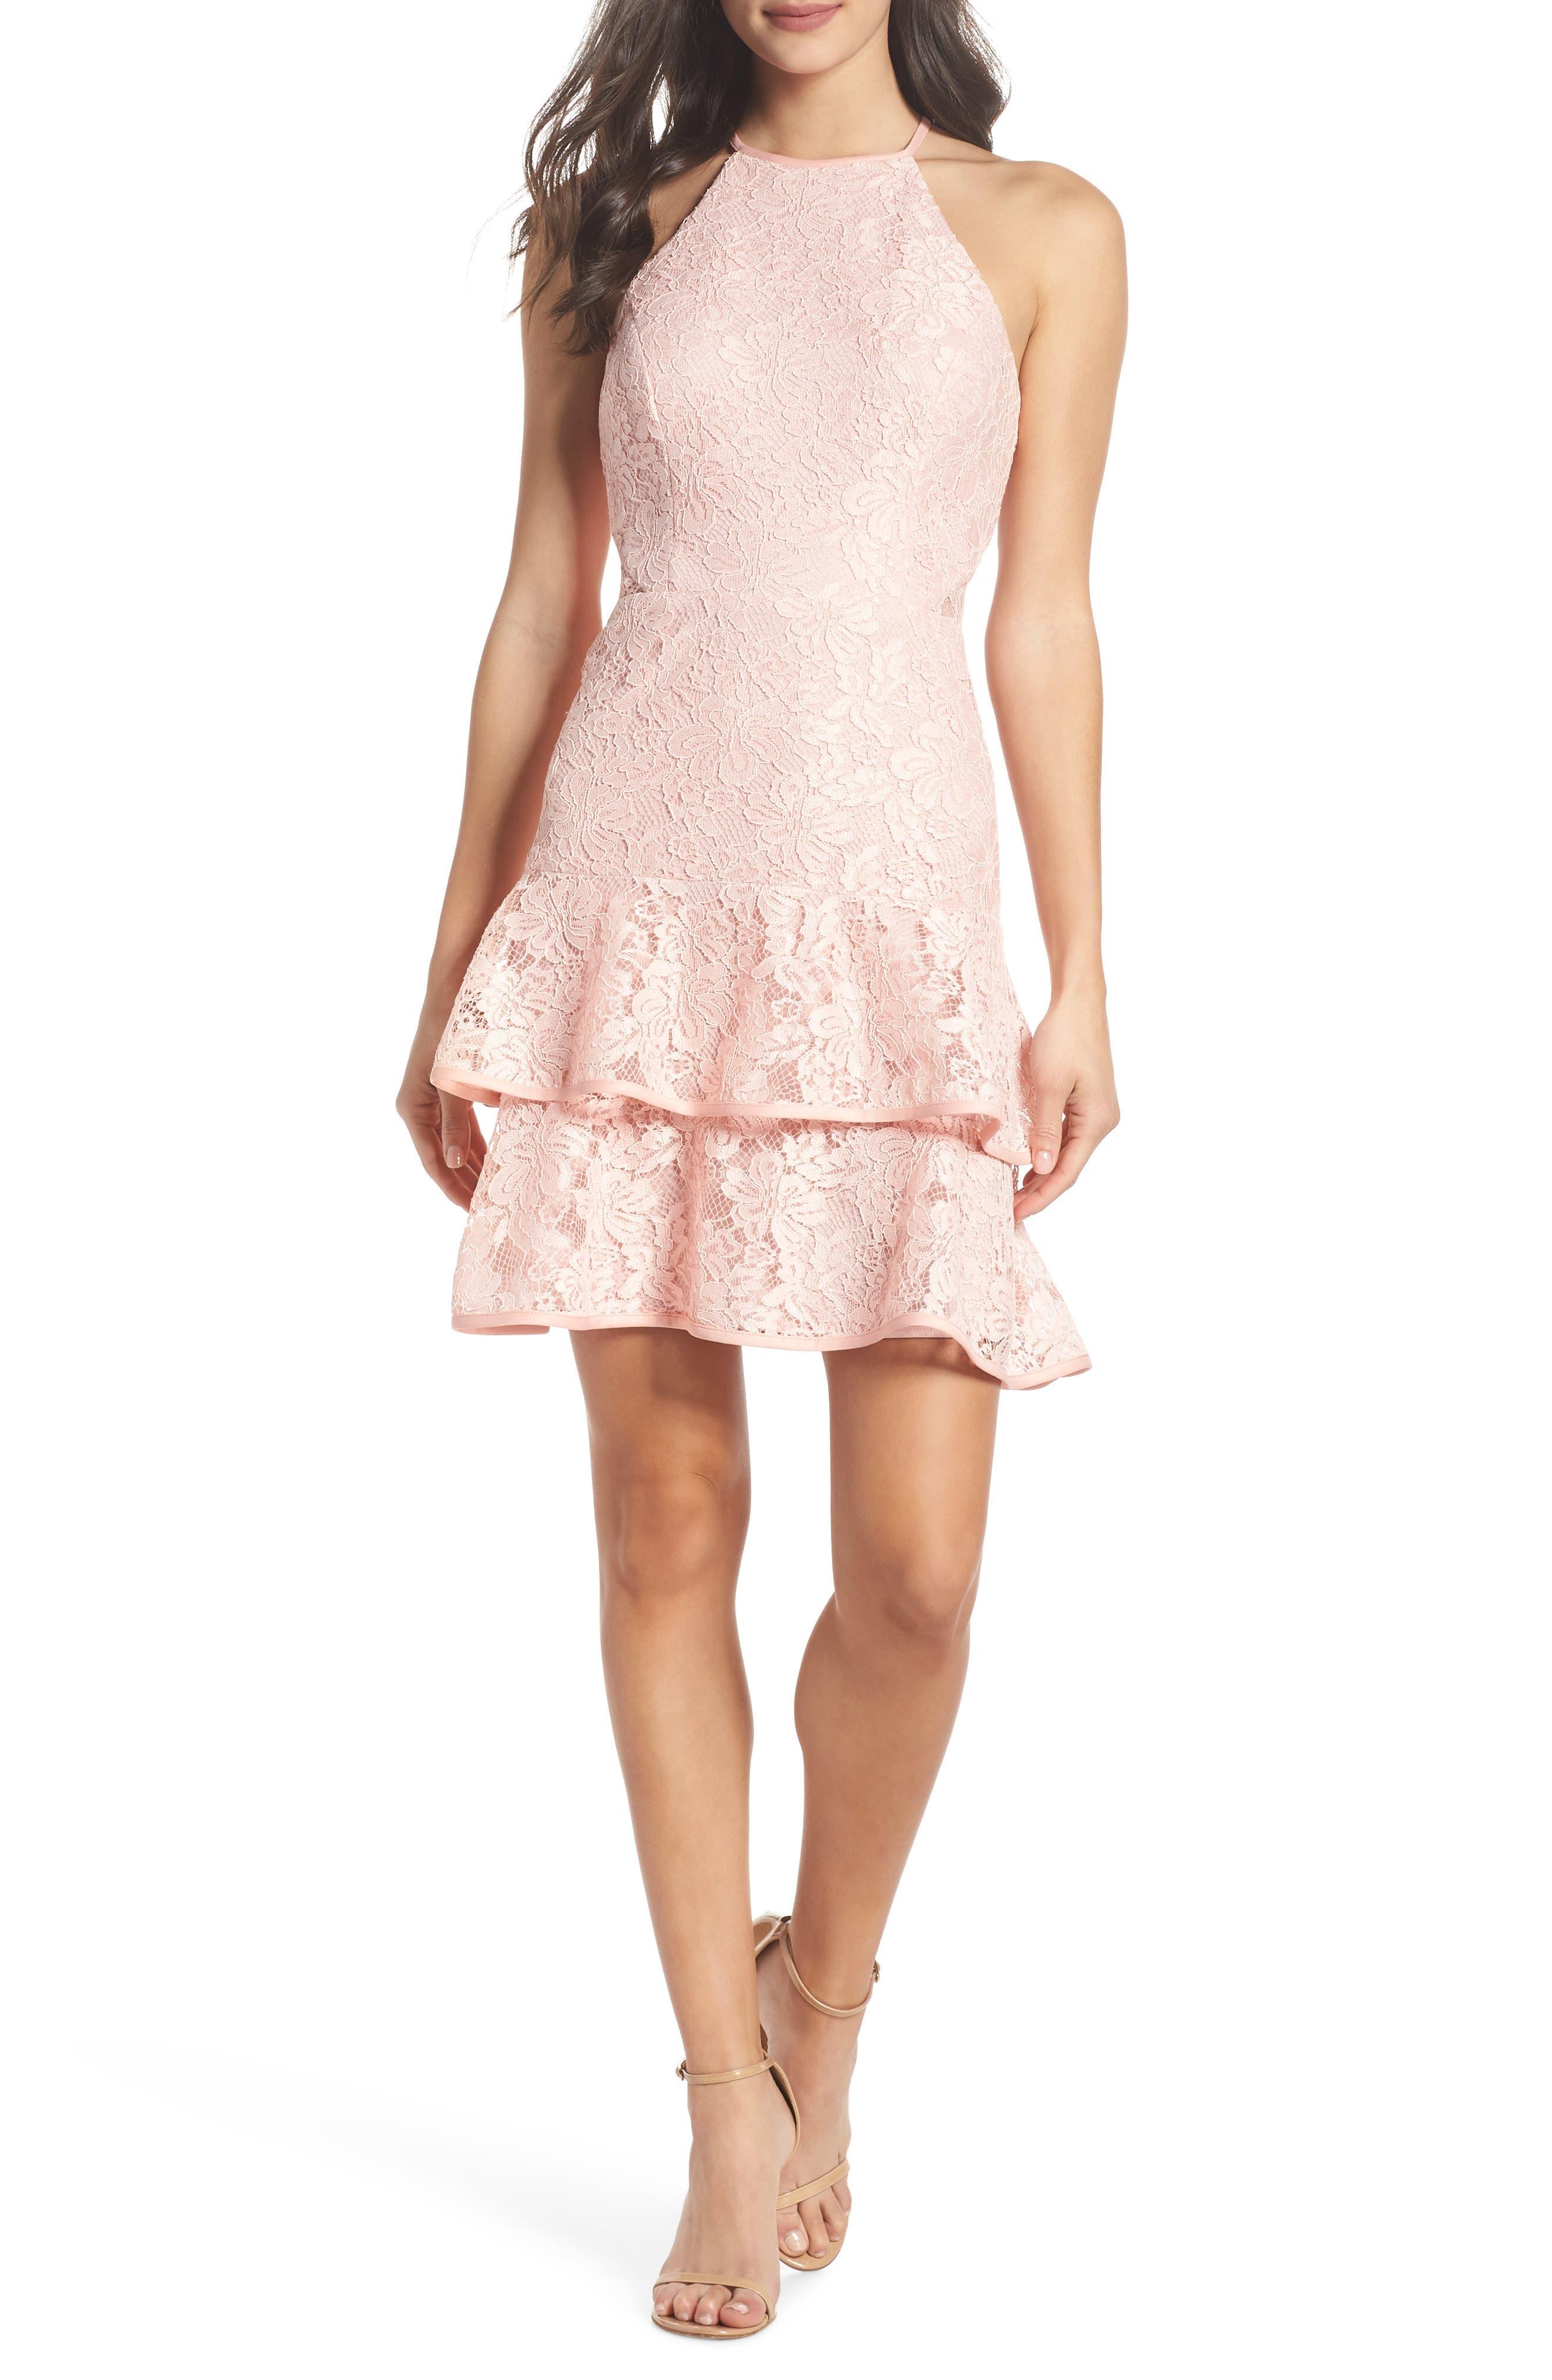 Ruffle Tier Lace Party Dress,                         Main,                         color, Blush